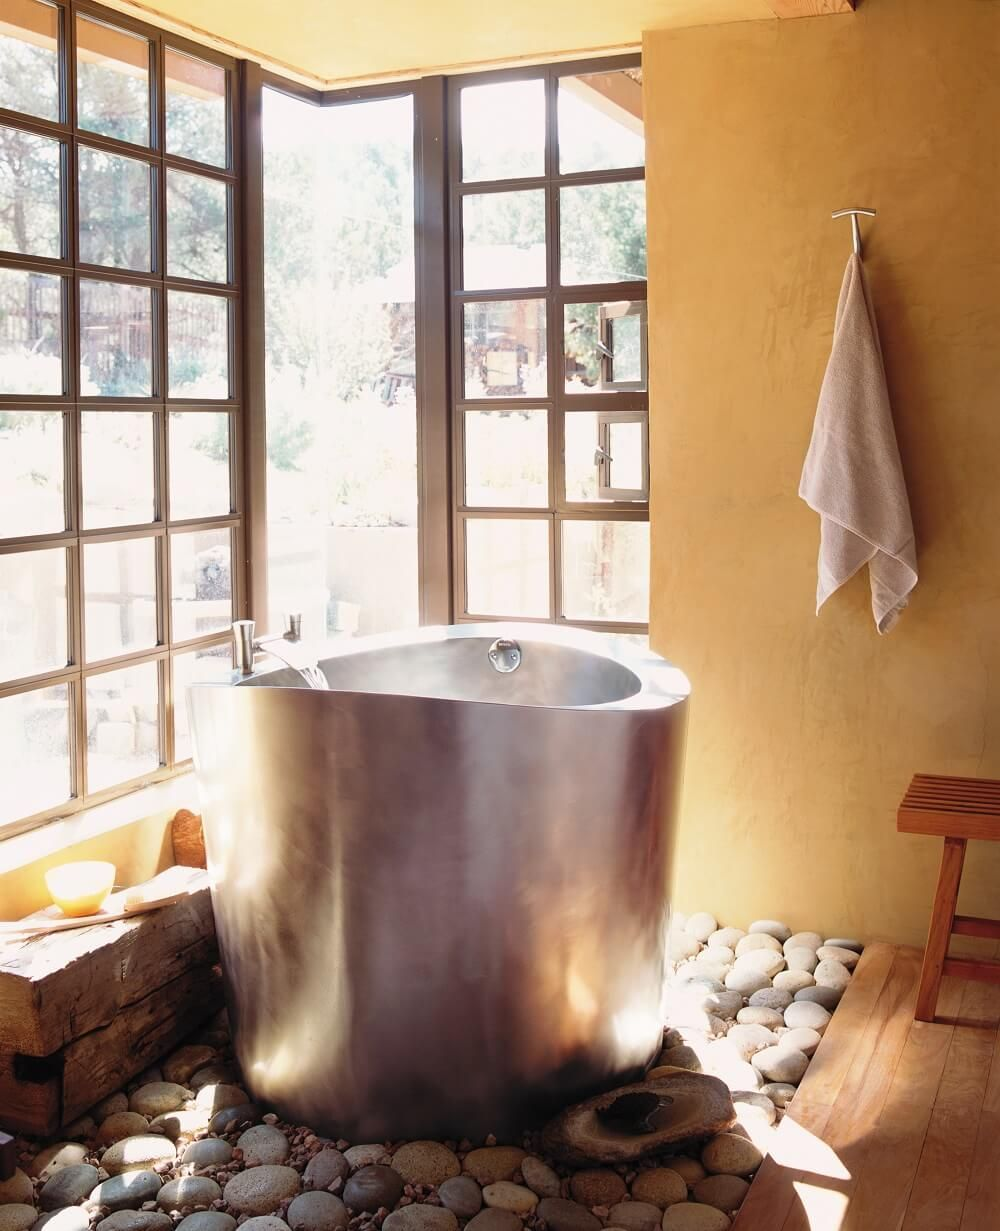 Salle De Bain Japonaise ~ stainless steel circular japanese soaking bath 42 round x 35